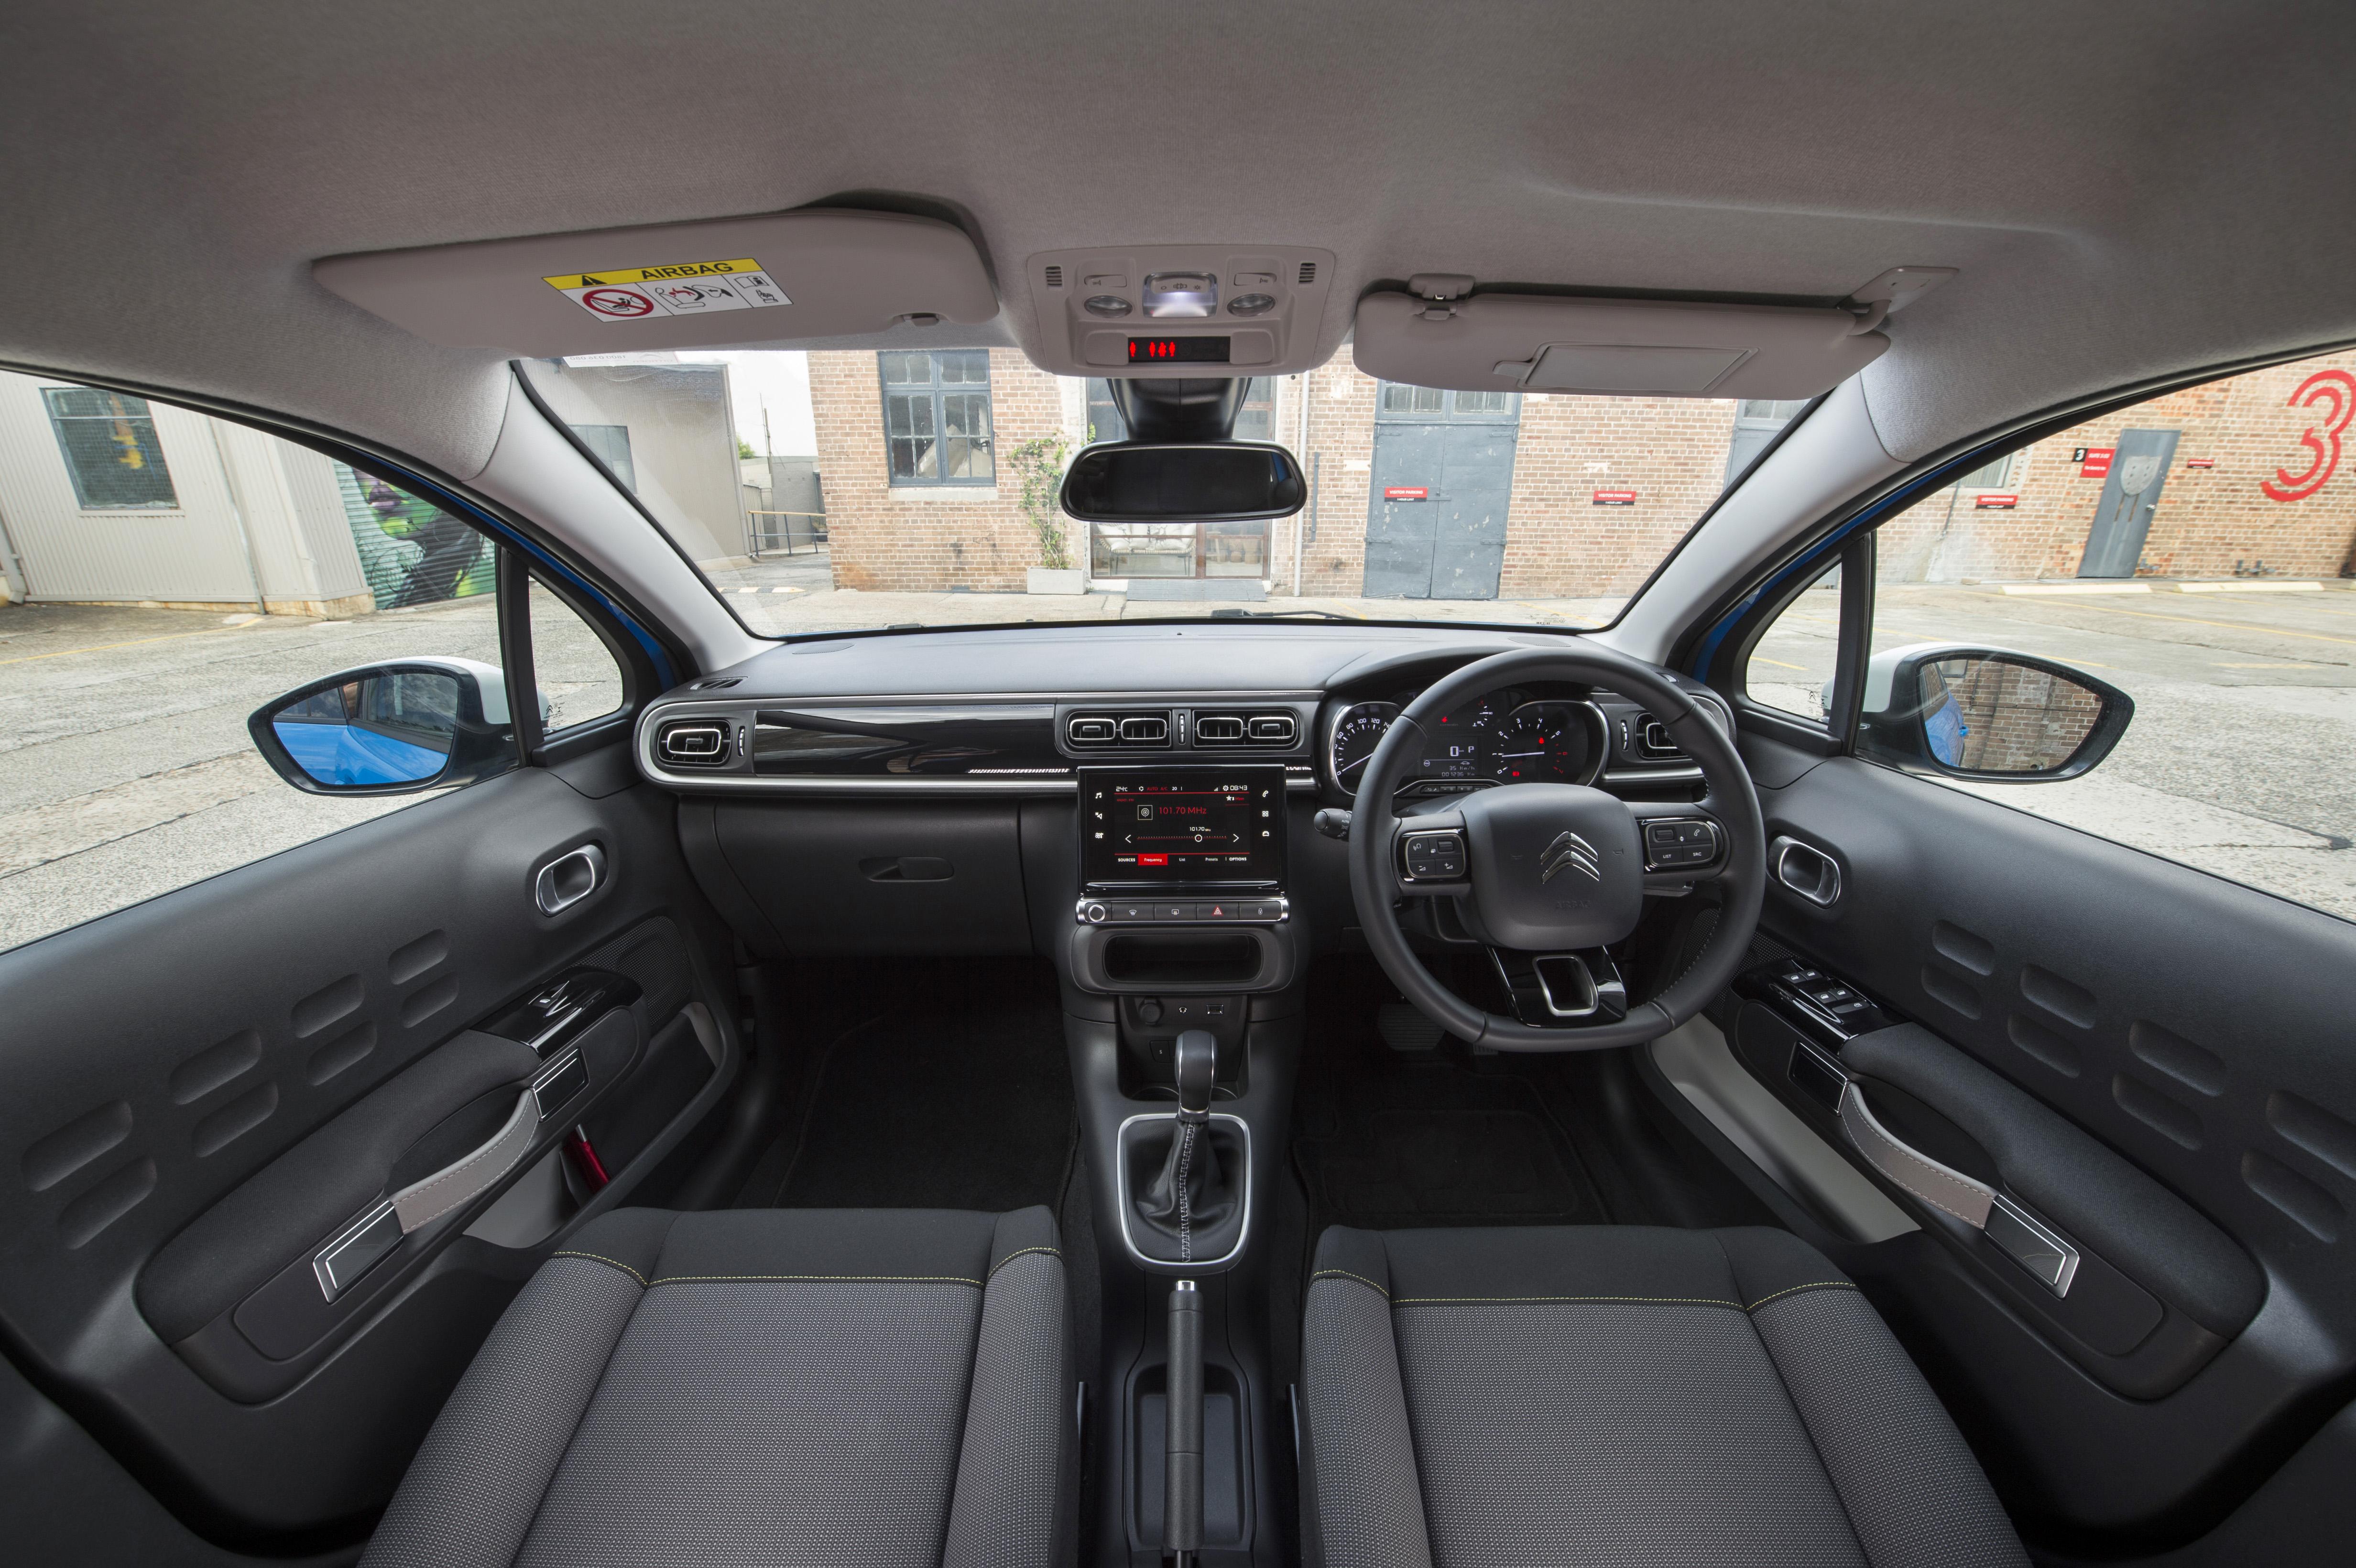 2018 Citroen C3.